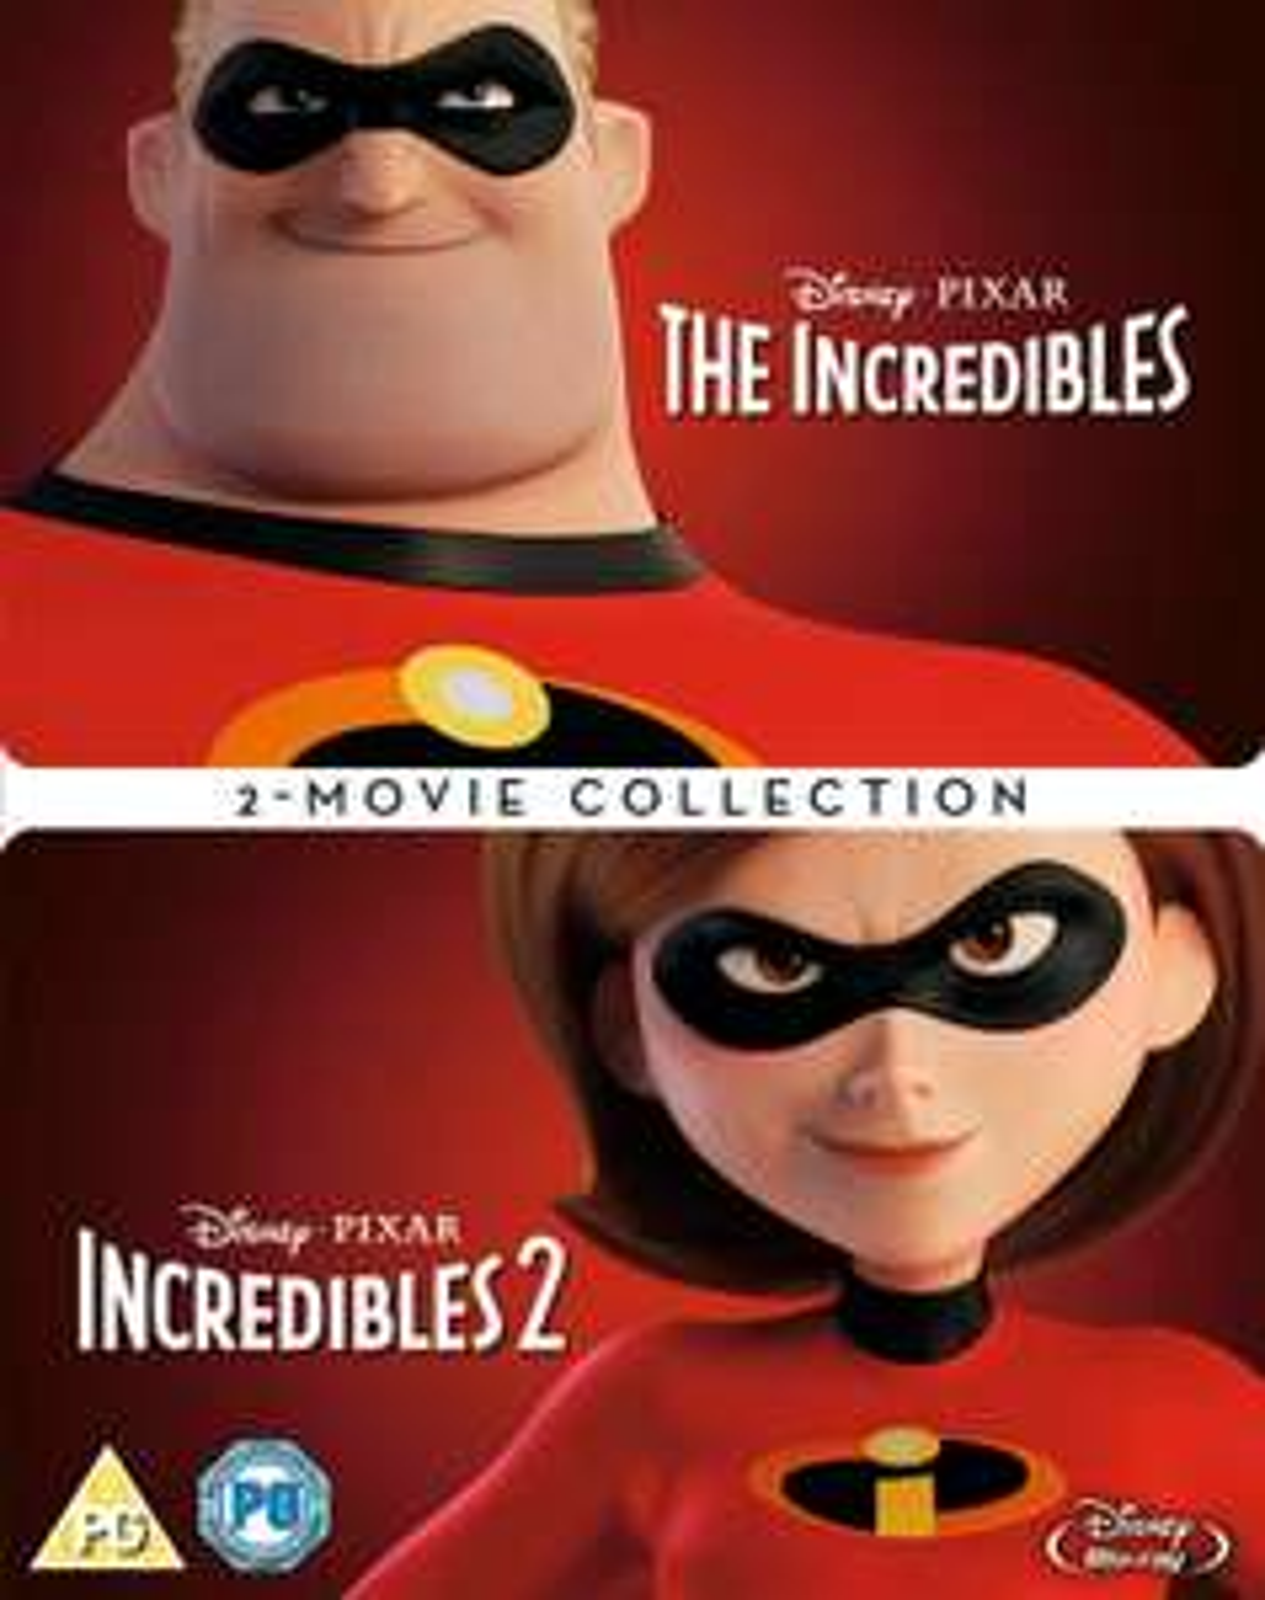 The Incredibles 1 & 2 Blu-Ray Boxset £13.00 (Prime) / £15.99 (non Prime) @ Amazon UK